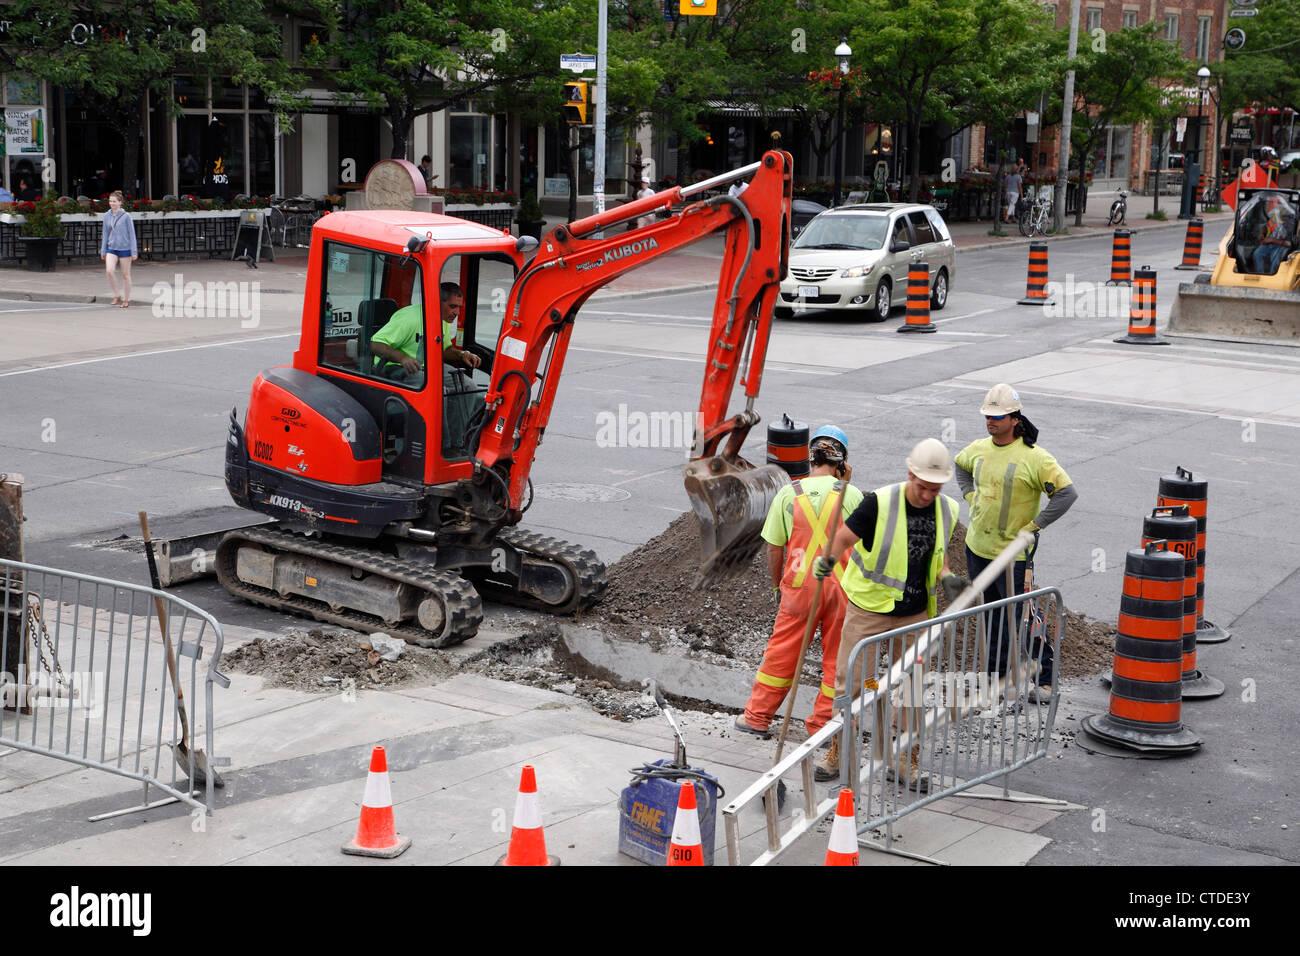 Road Crew Repairing A Street In Toronto Canada - Stock Image